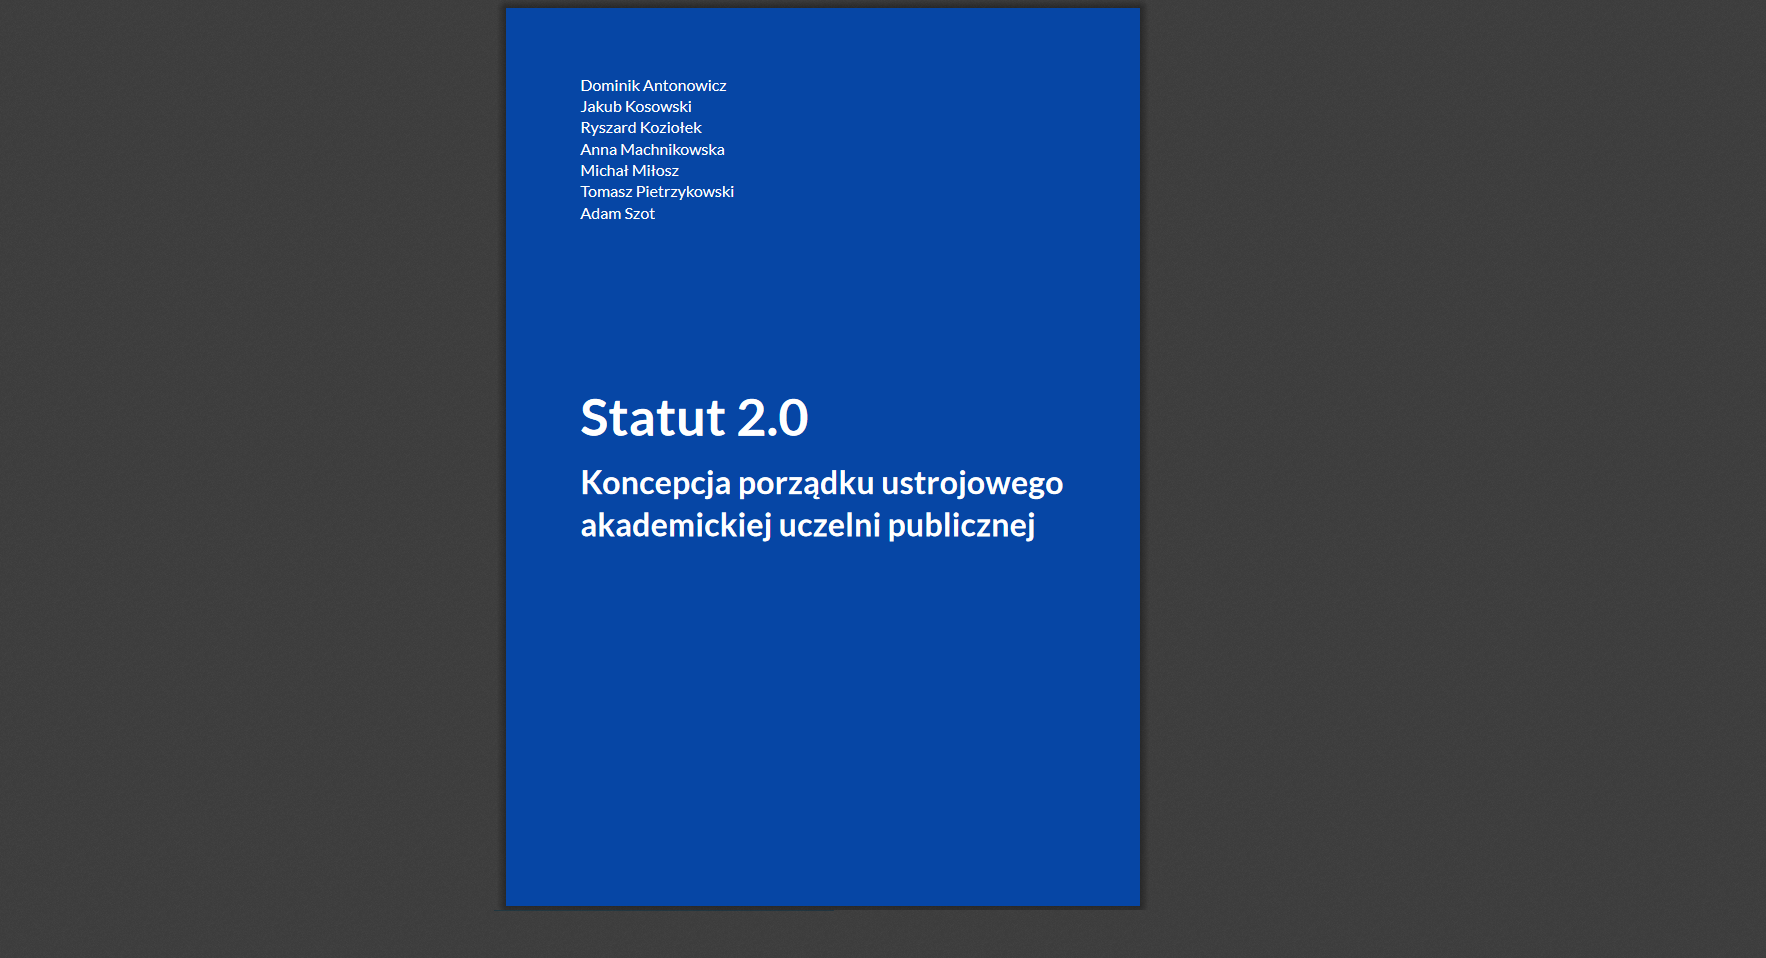 Status 2.0 (źródło: Status 2.0, statut20.umk.pl)